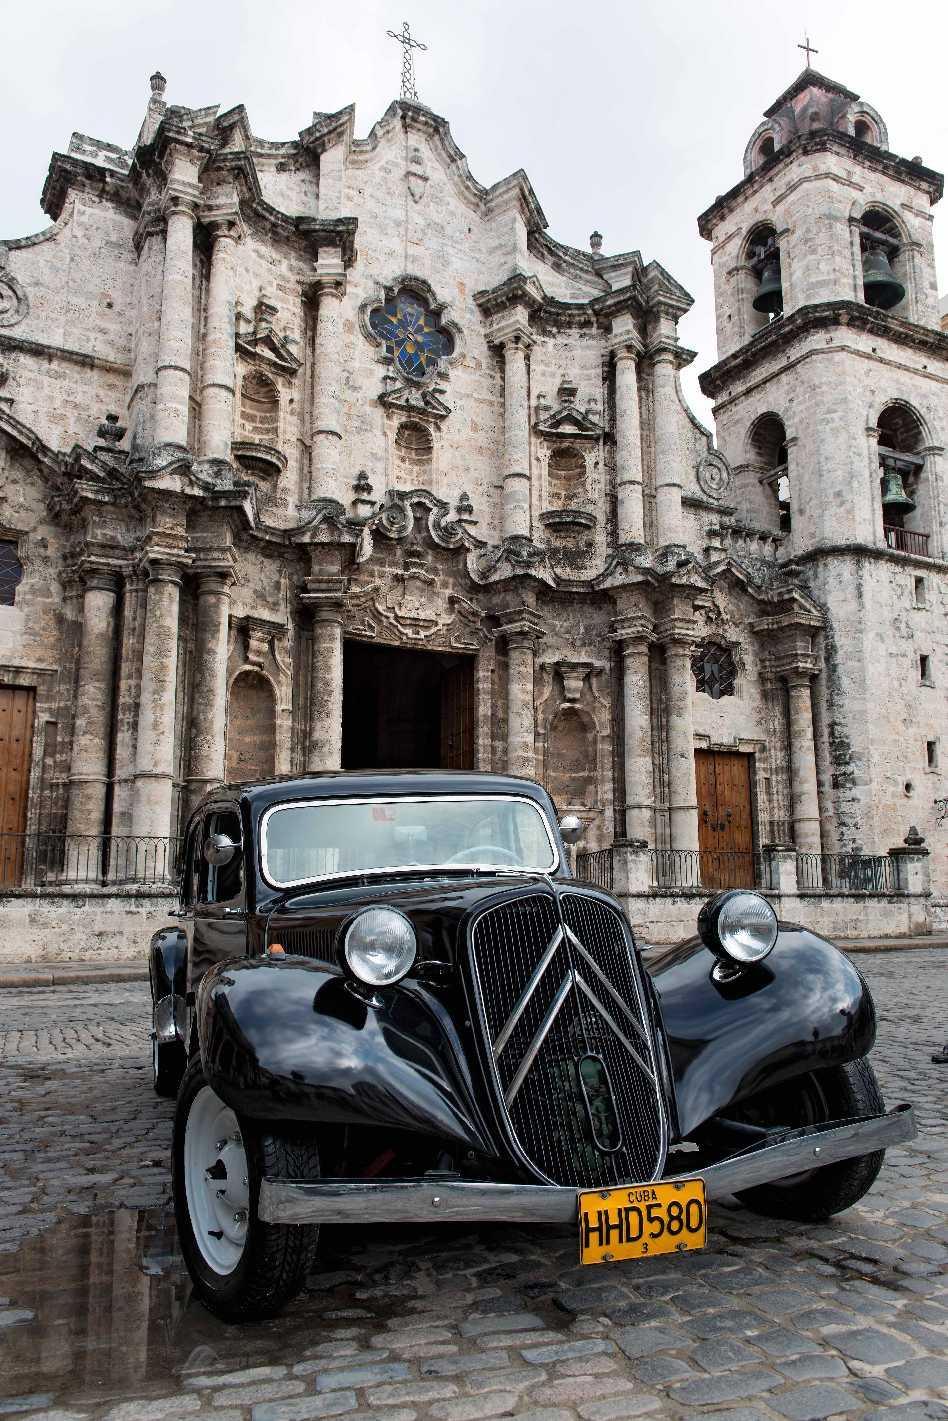 Havana, Autos & Architecture  - CA2 2013 DSC8370 37